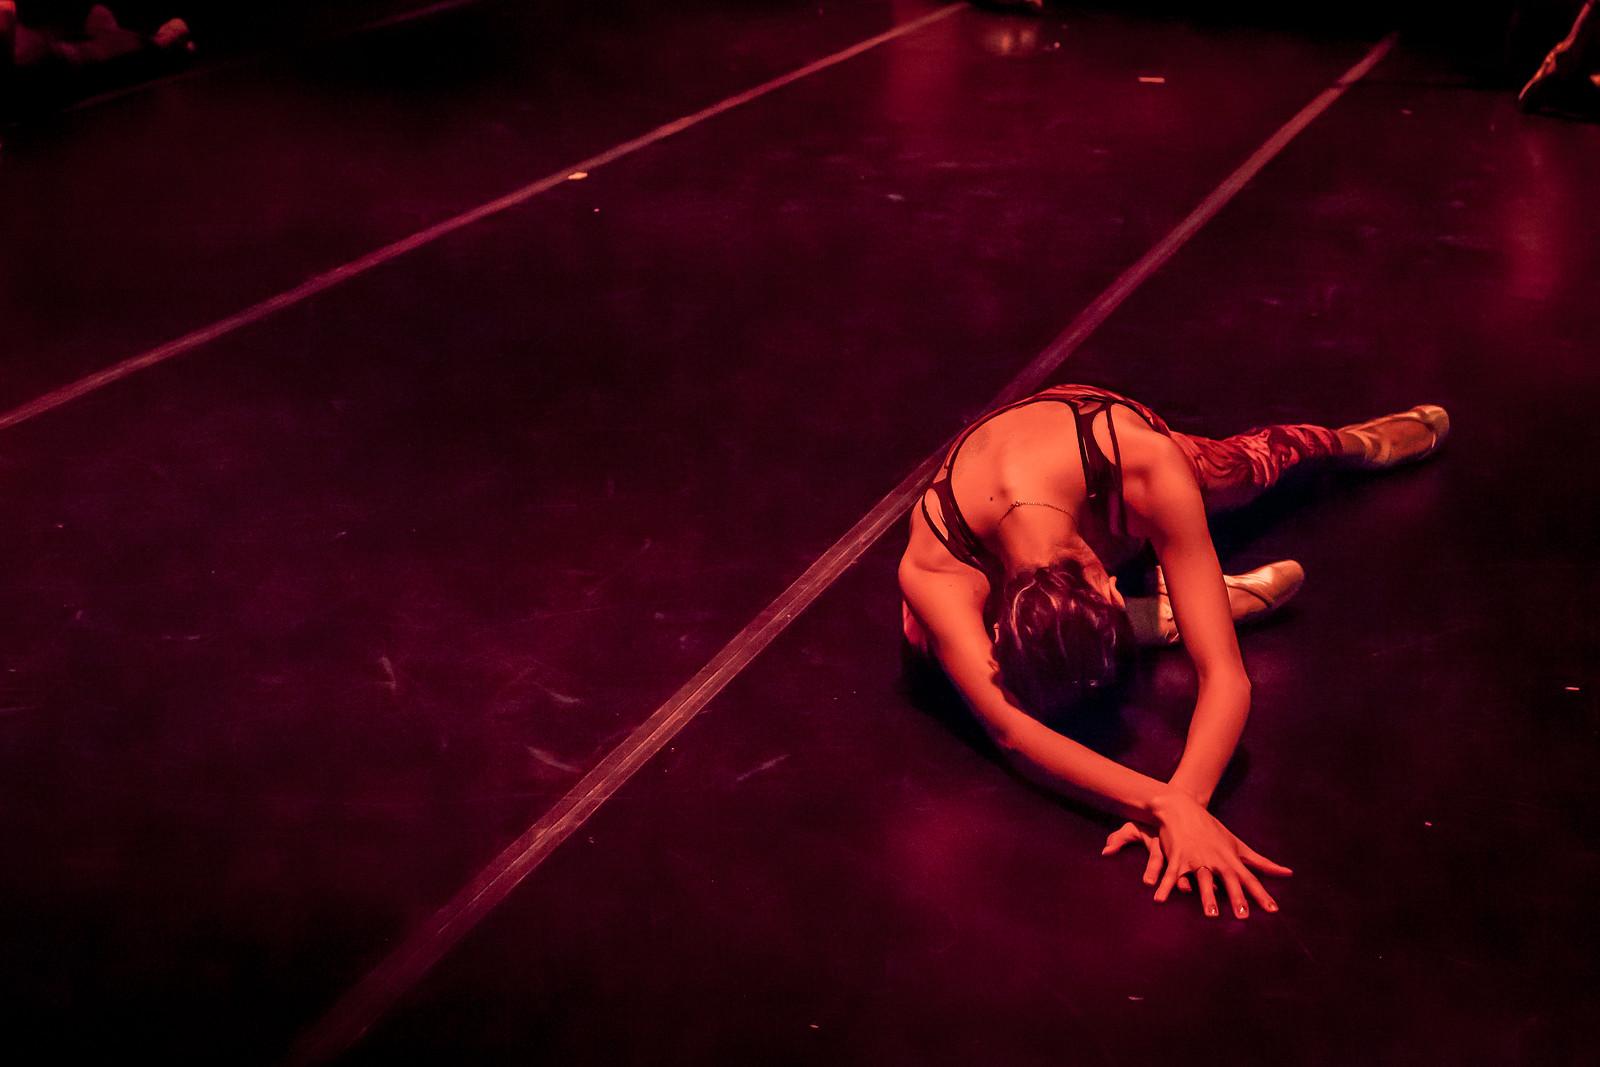 Dancer by wwward0